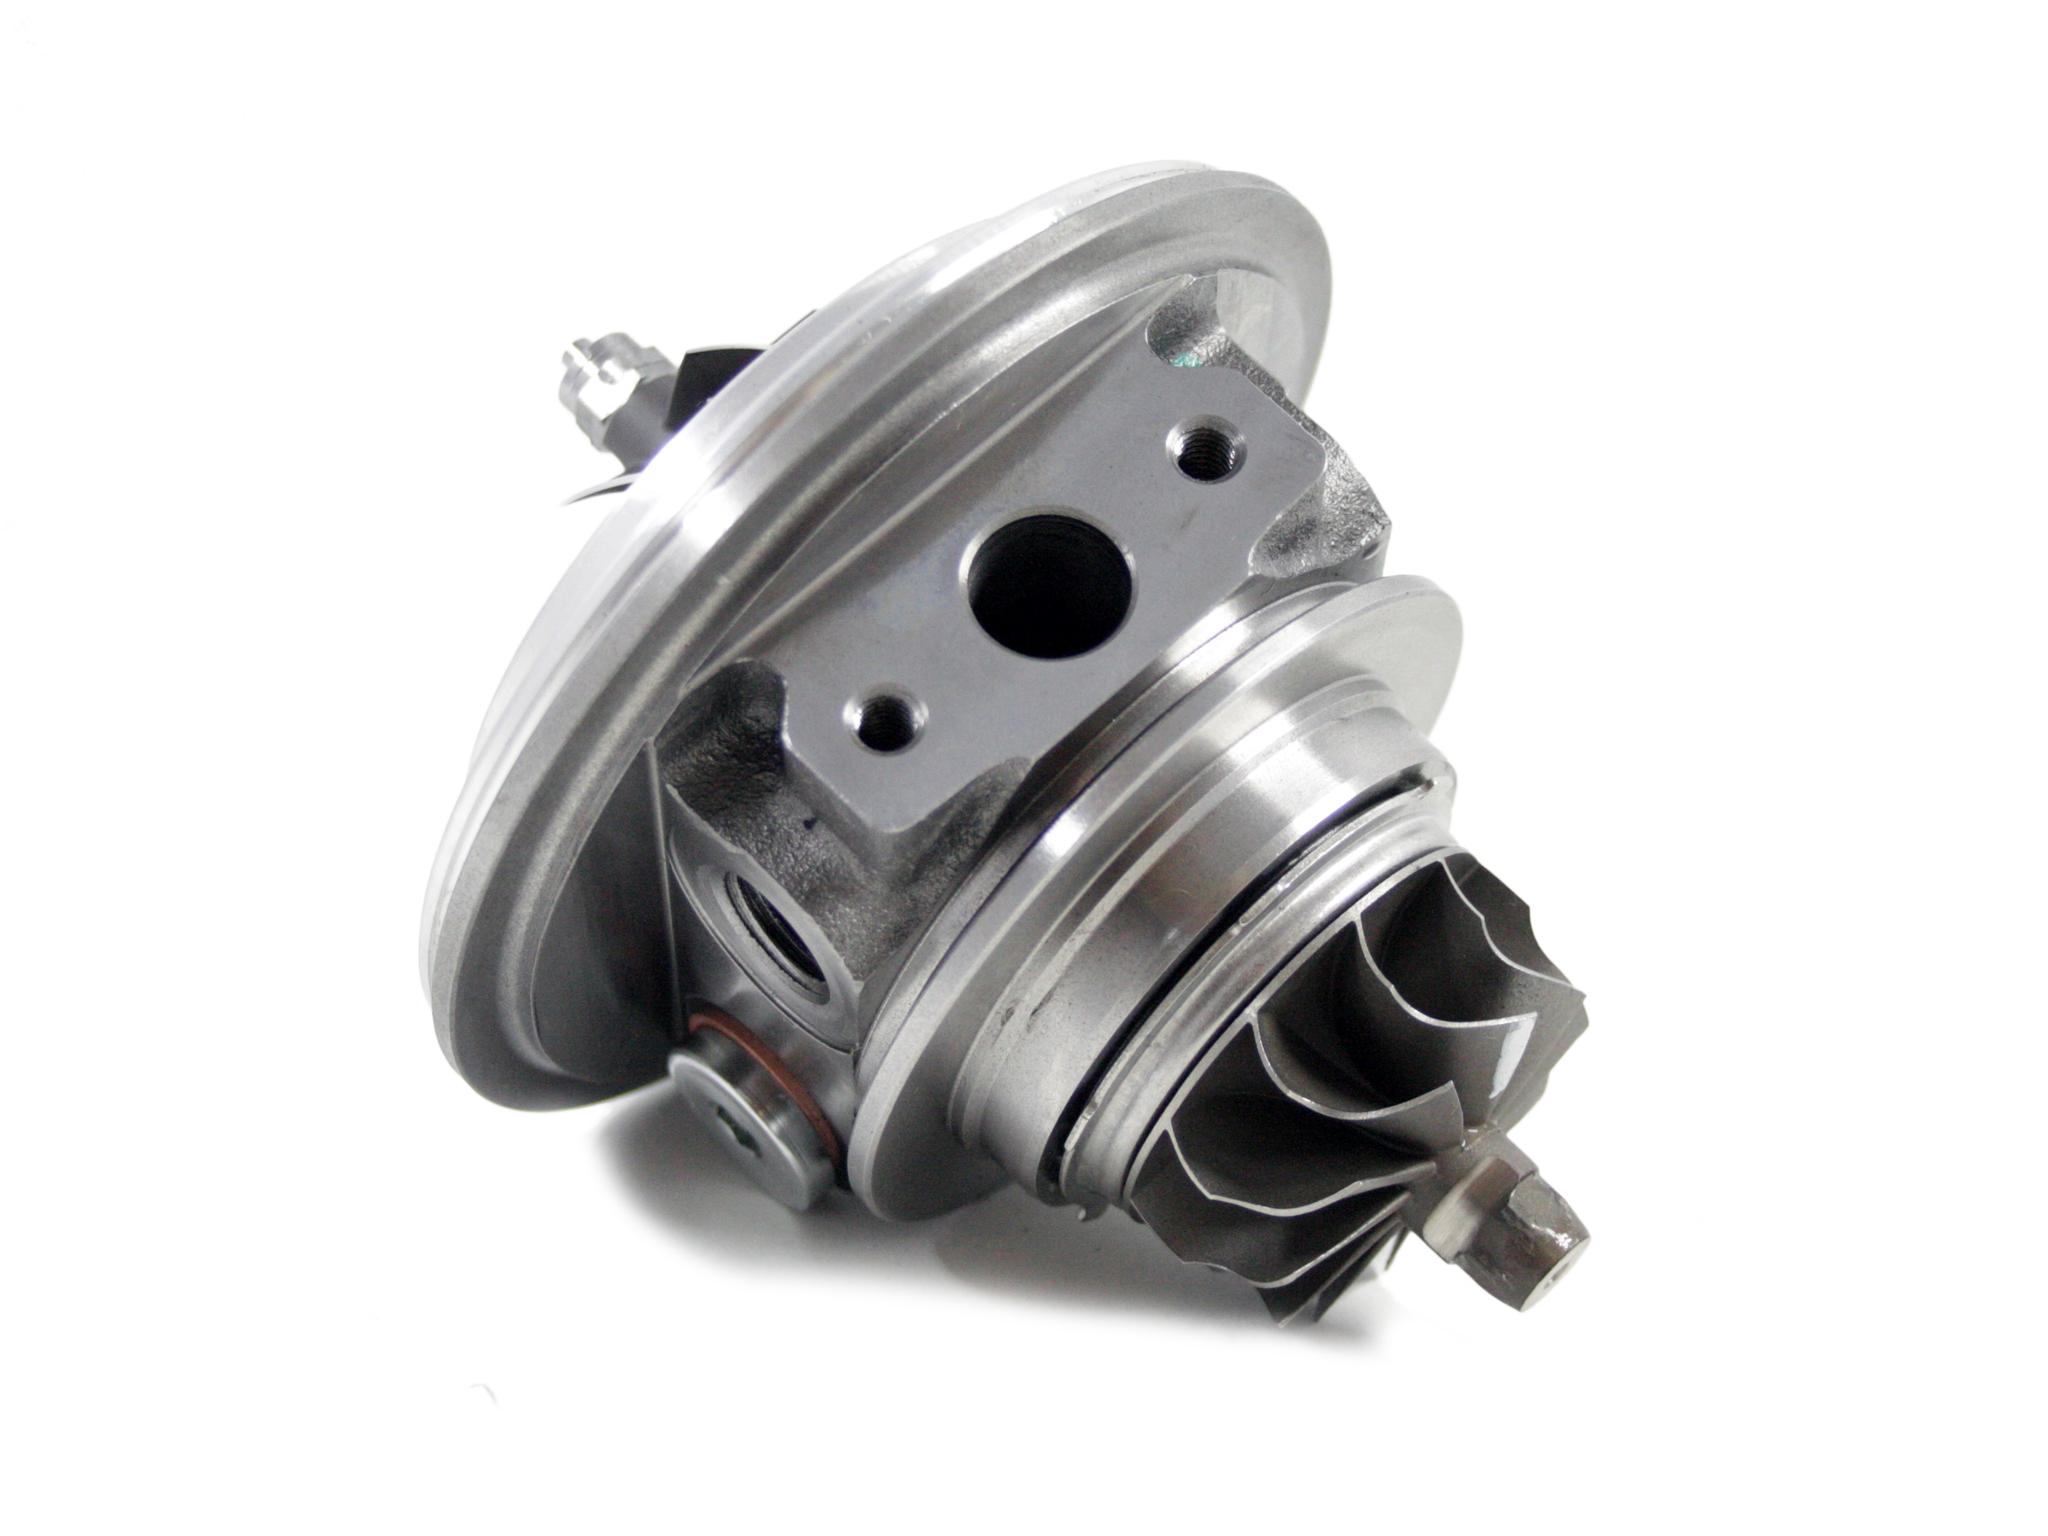 Картридж турбины К03 Шкода 1.8 TFSI 152 л.с.